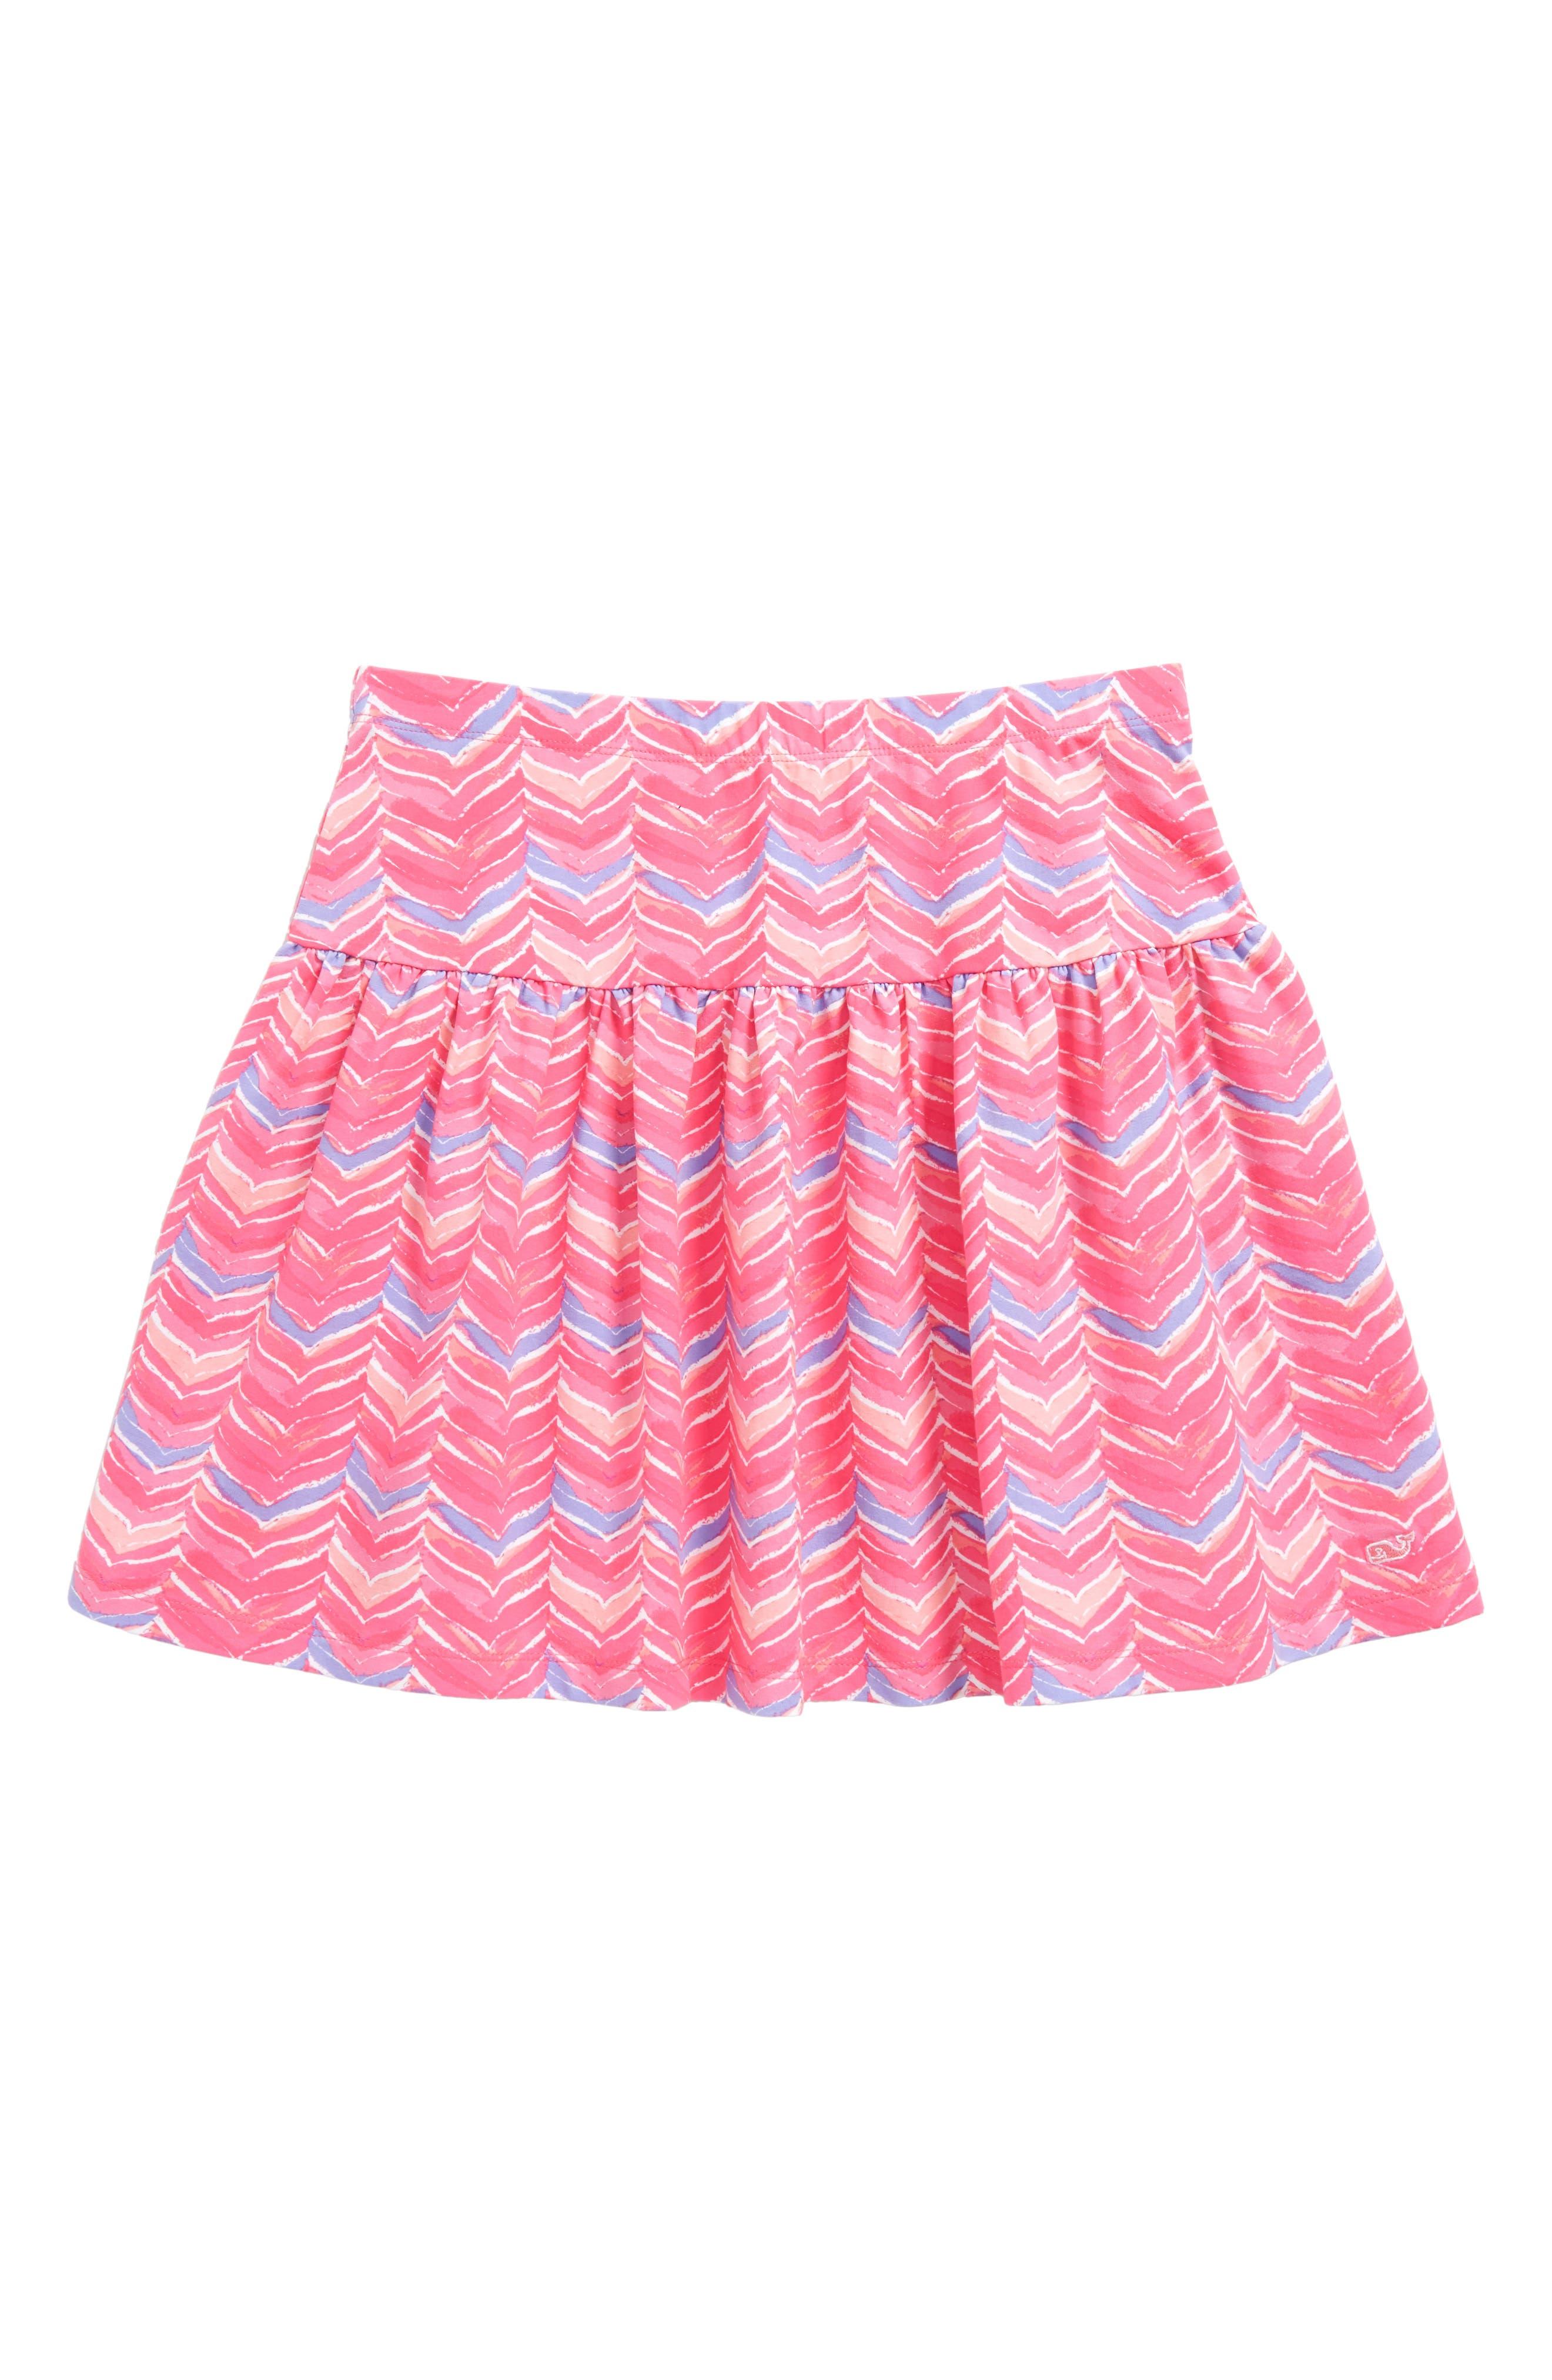 Main Image - vineyard vines Watercolor Whale Tail Print Skirt (Little Girls & Big Girls)